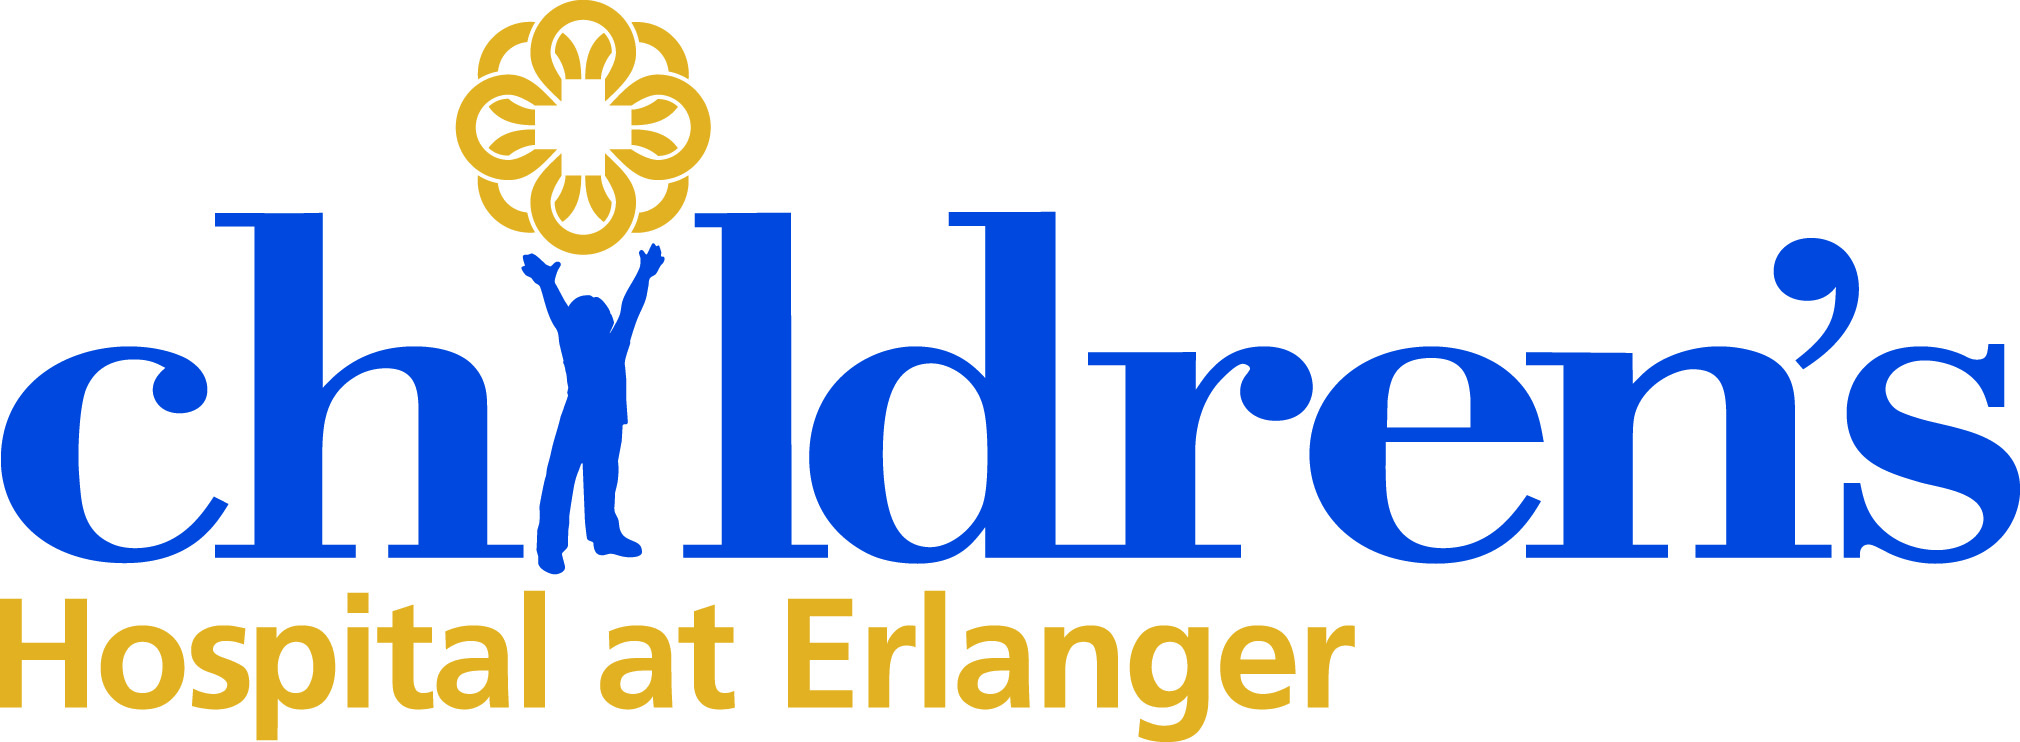 Children's Hospital at Erlanger